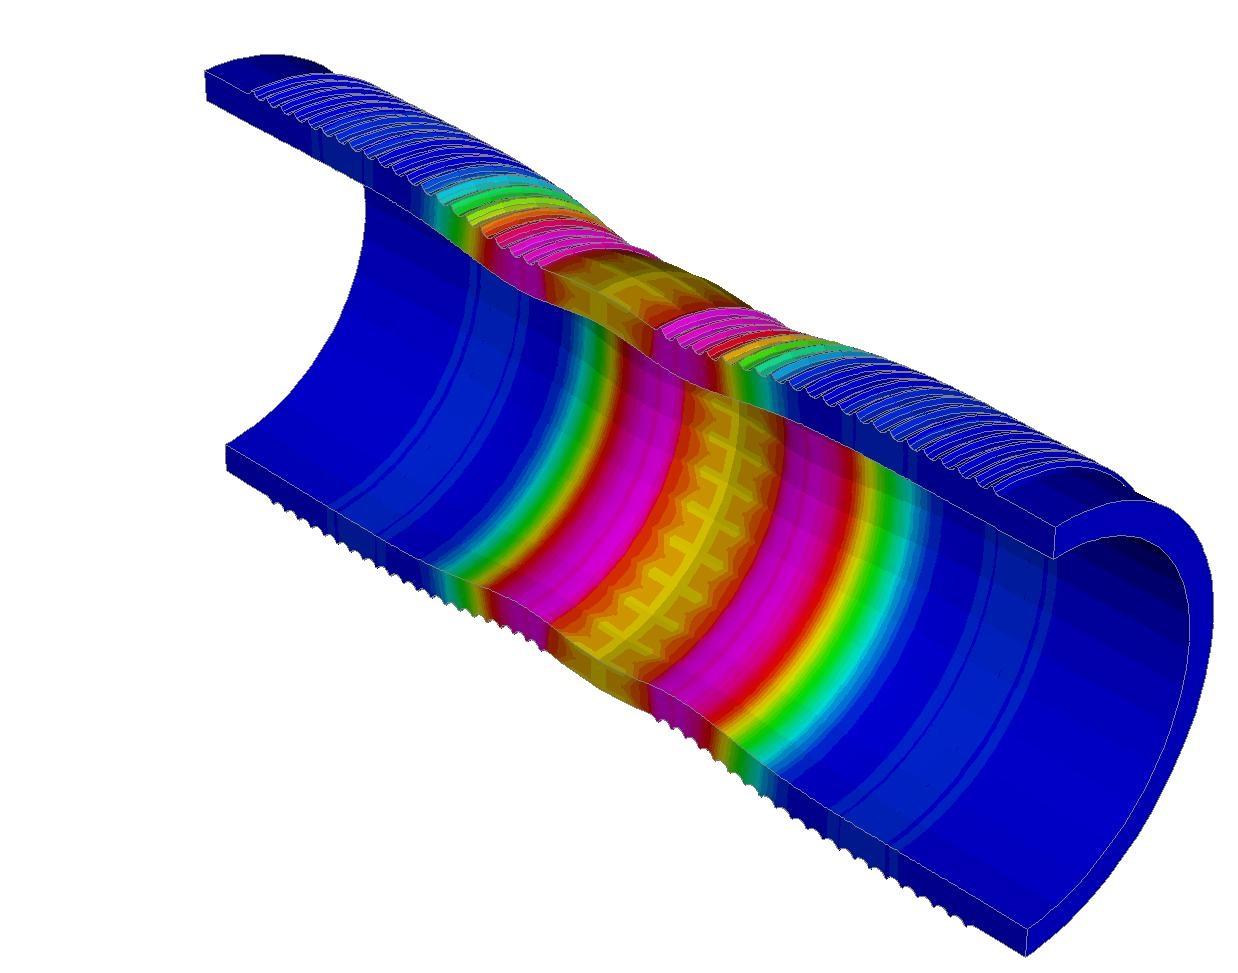 zlab-acoustics-laboratory-rams-analysis-industry-advanced-modeling